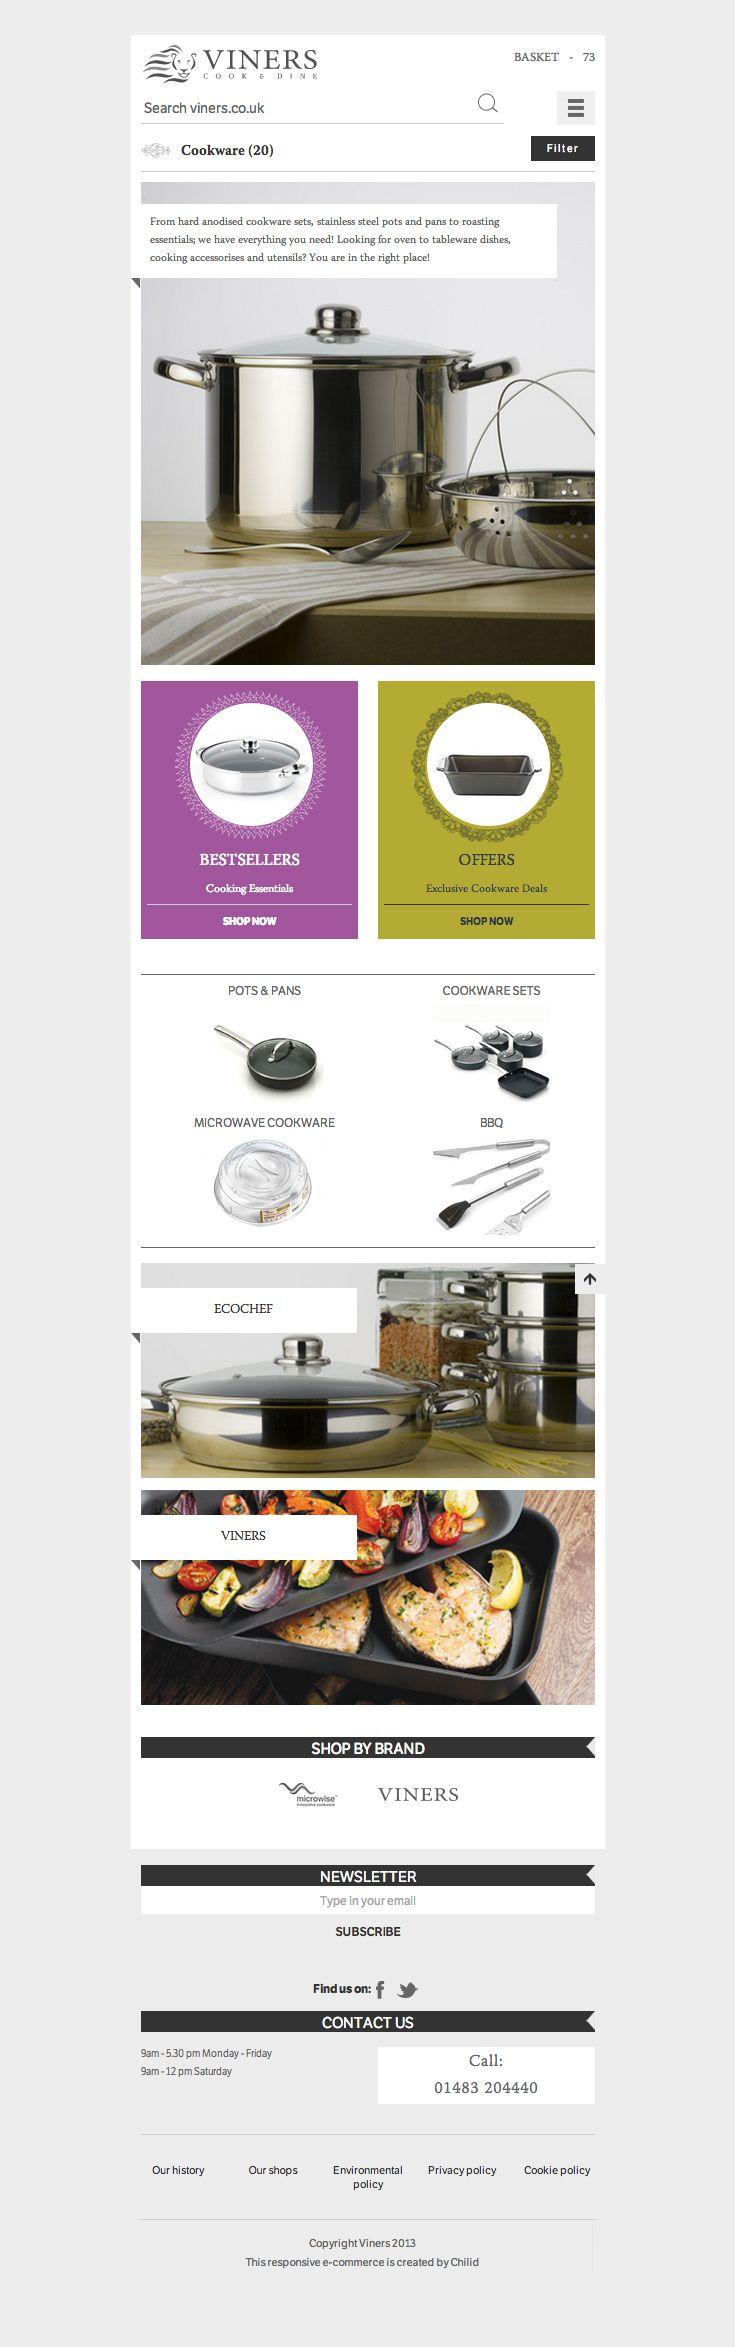 Viners Oneida Ltd / The Main Category Page – impressive heritage of Oneida Ltd. brands – responsive e-commerce website www.viners.co.uk/